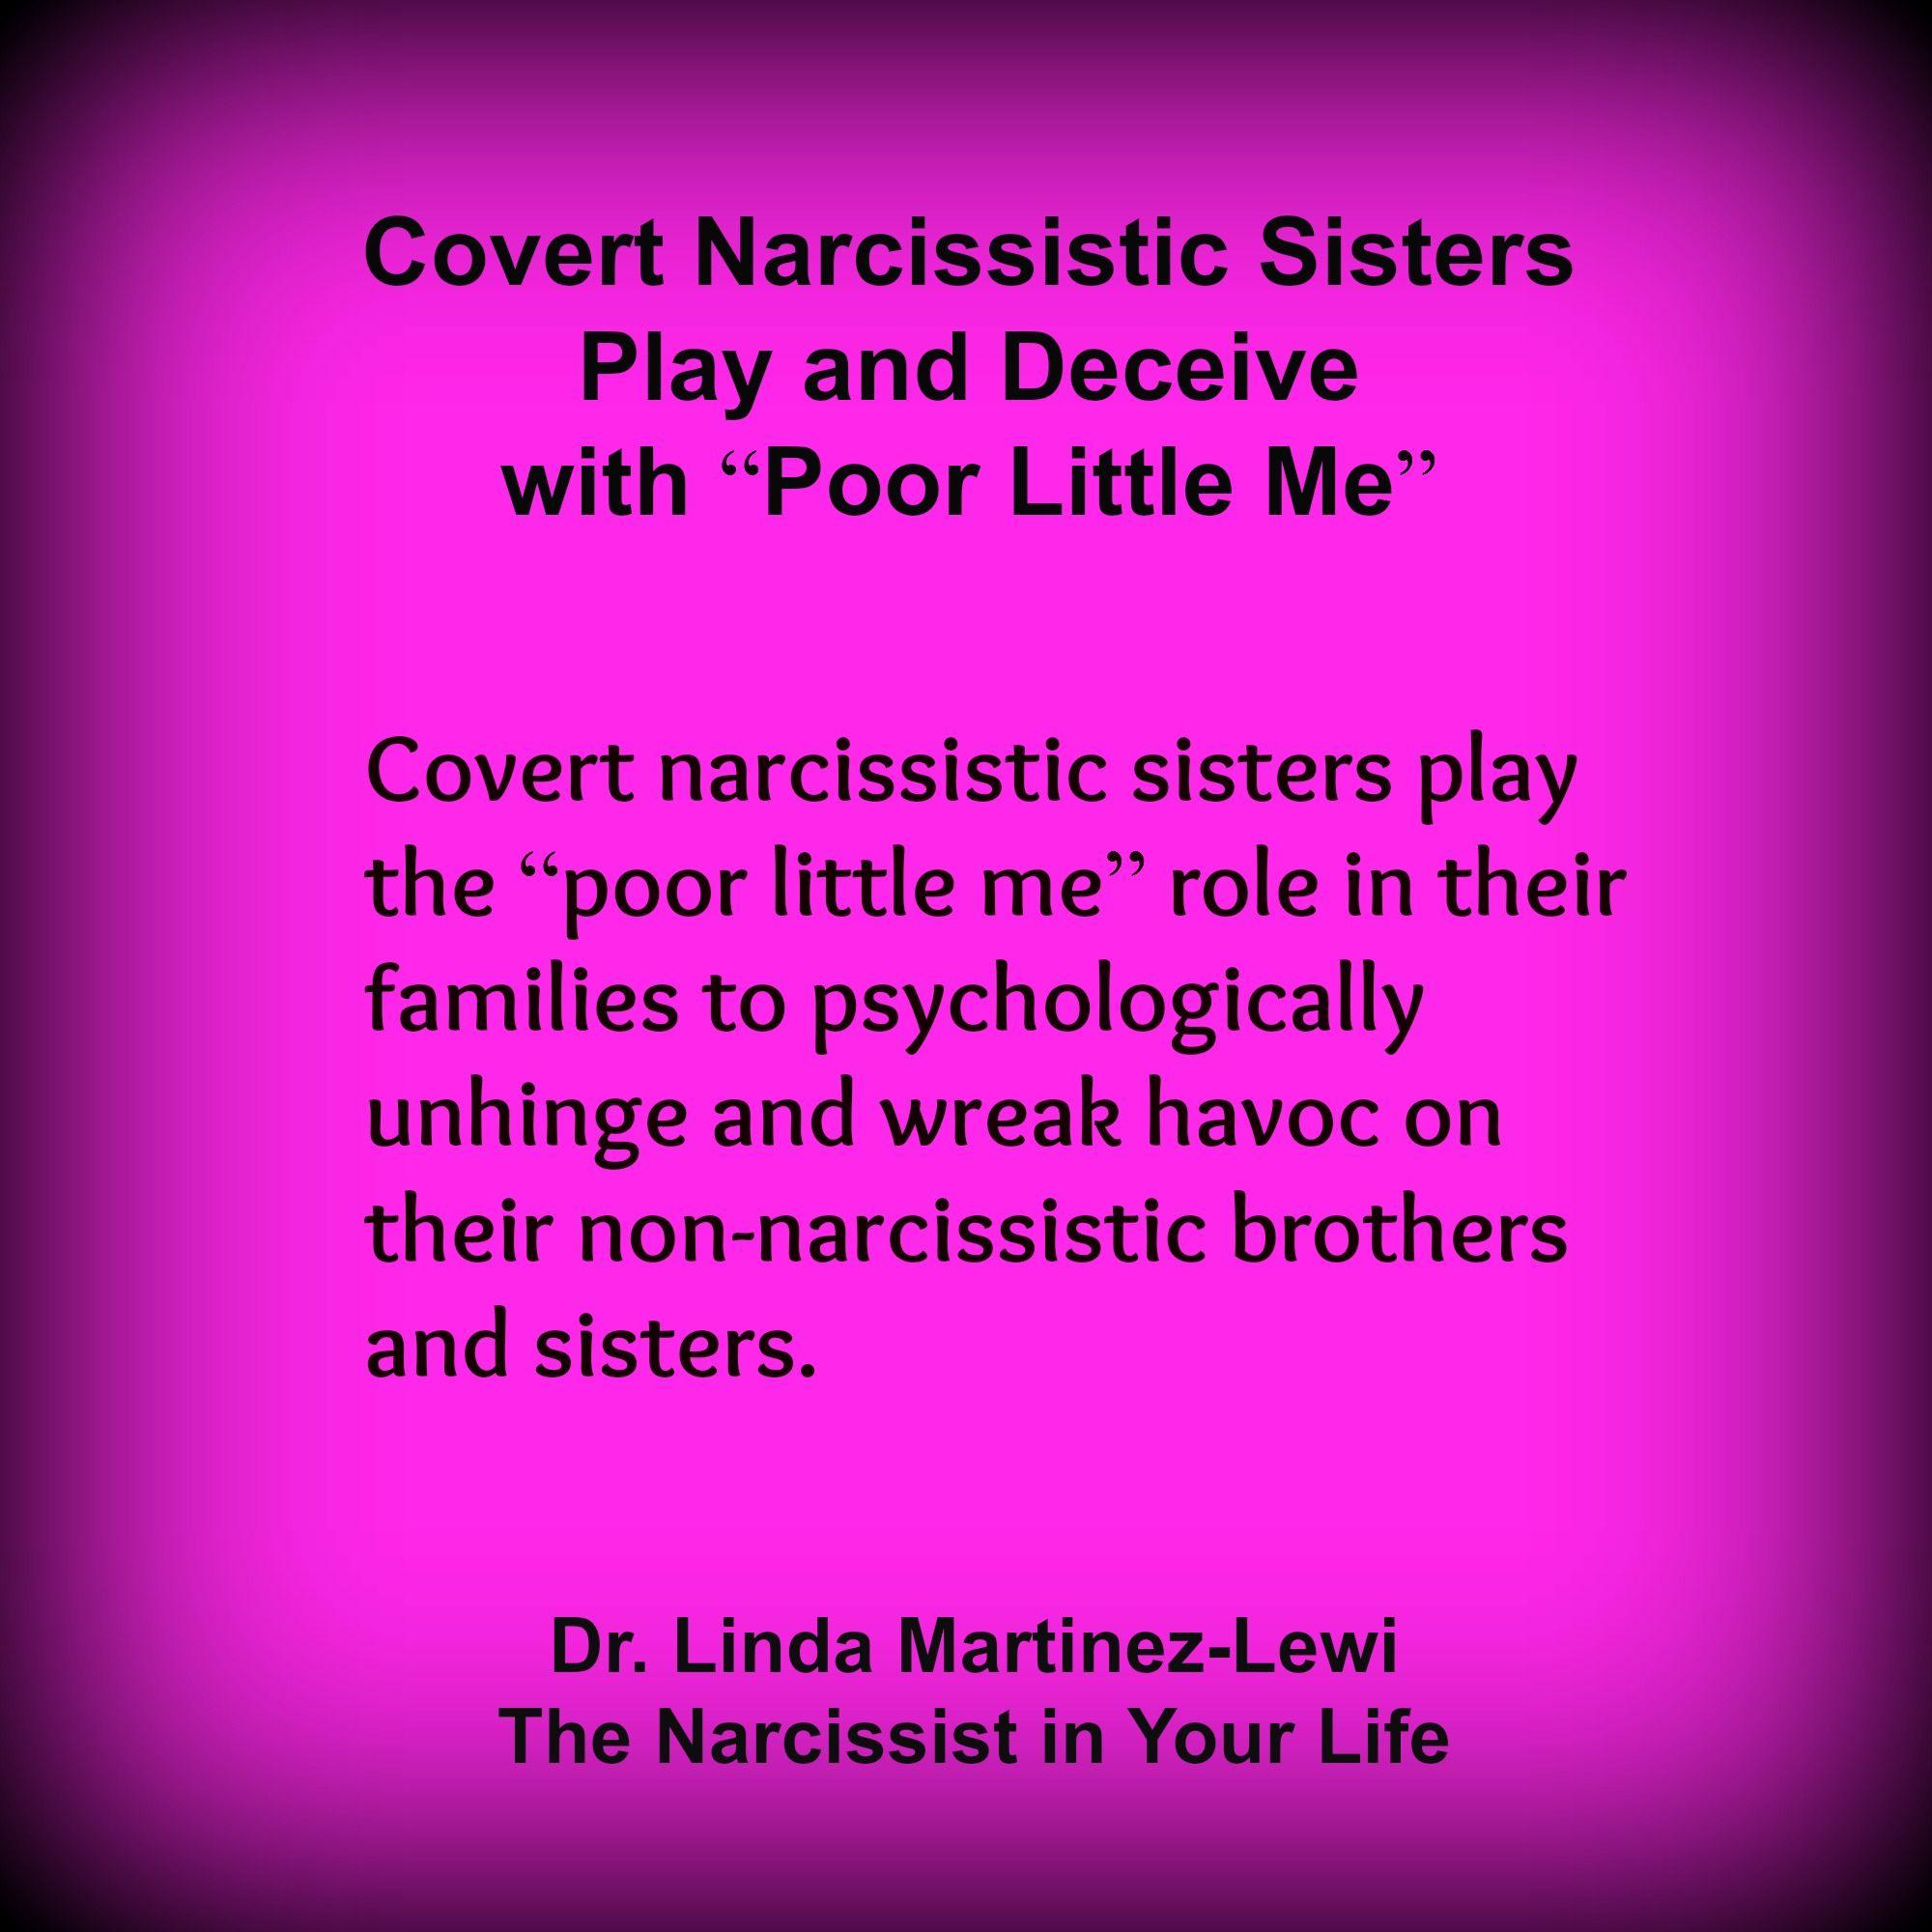 Dr  Linda Martinez-Lewi, Covert Narcissistic Sisters Play